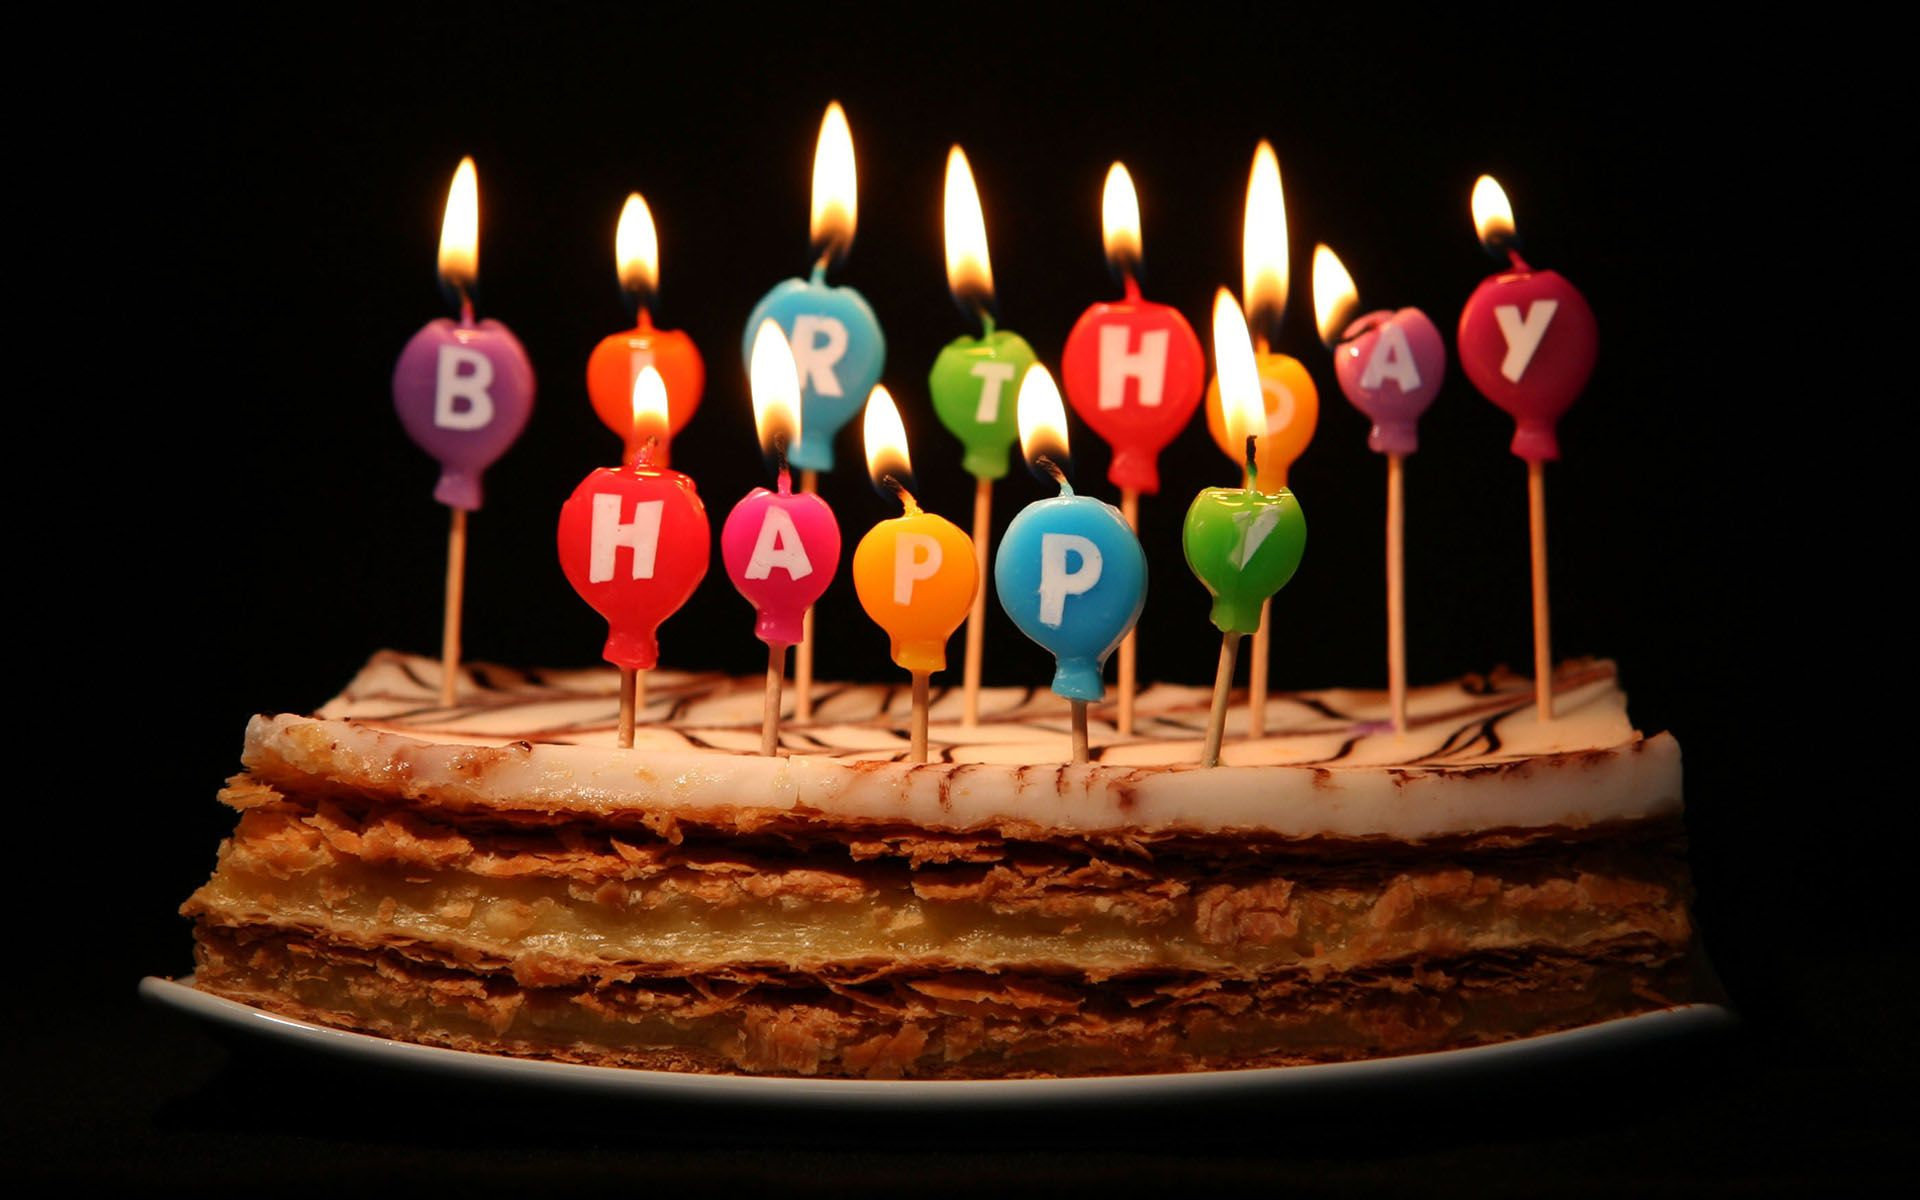 Hd wallpaper birthday - Myself Birthday Quoter Wallpaper Birthday Bling Self